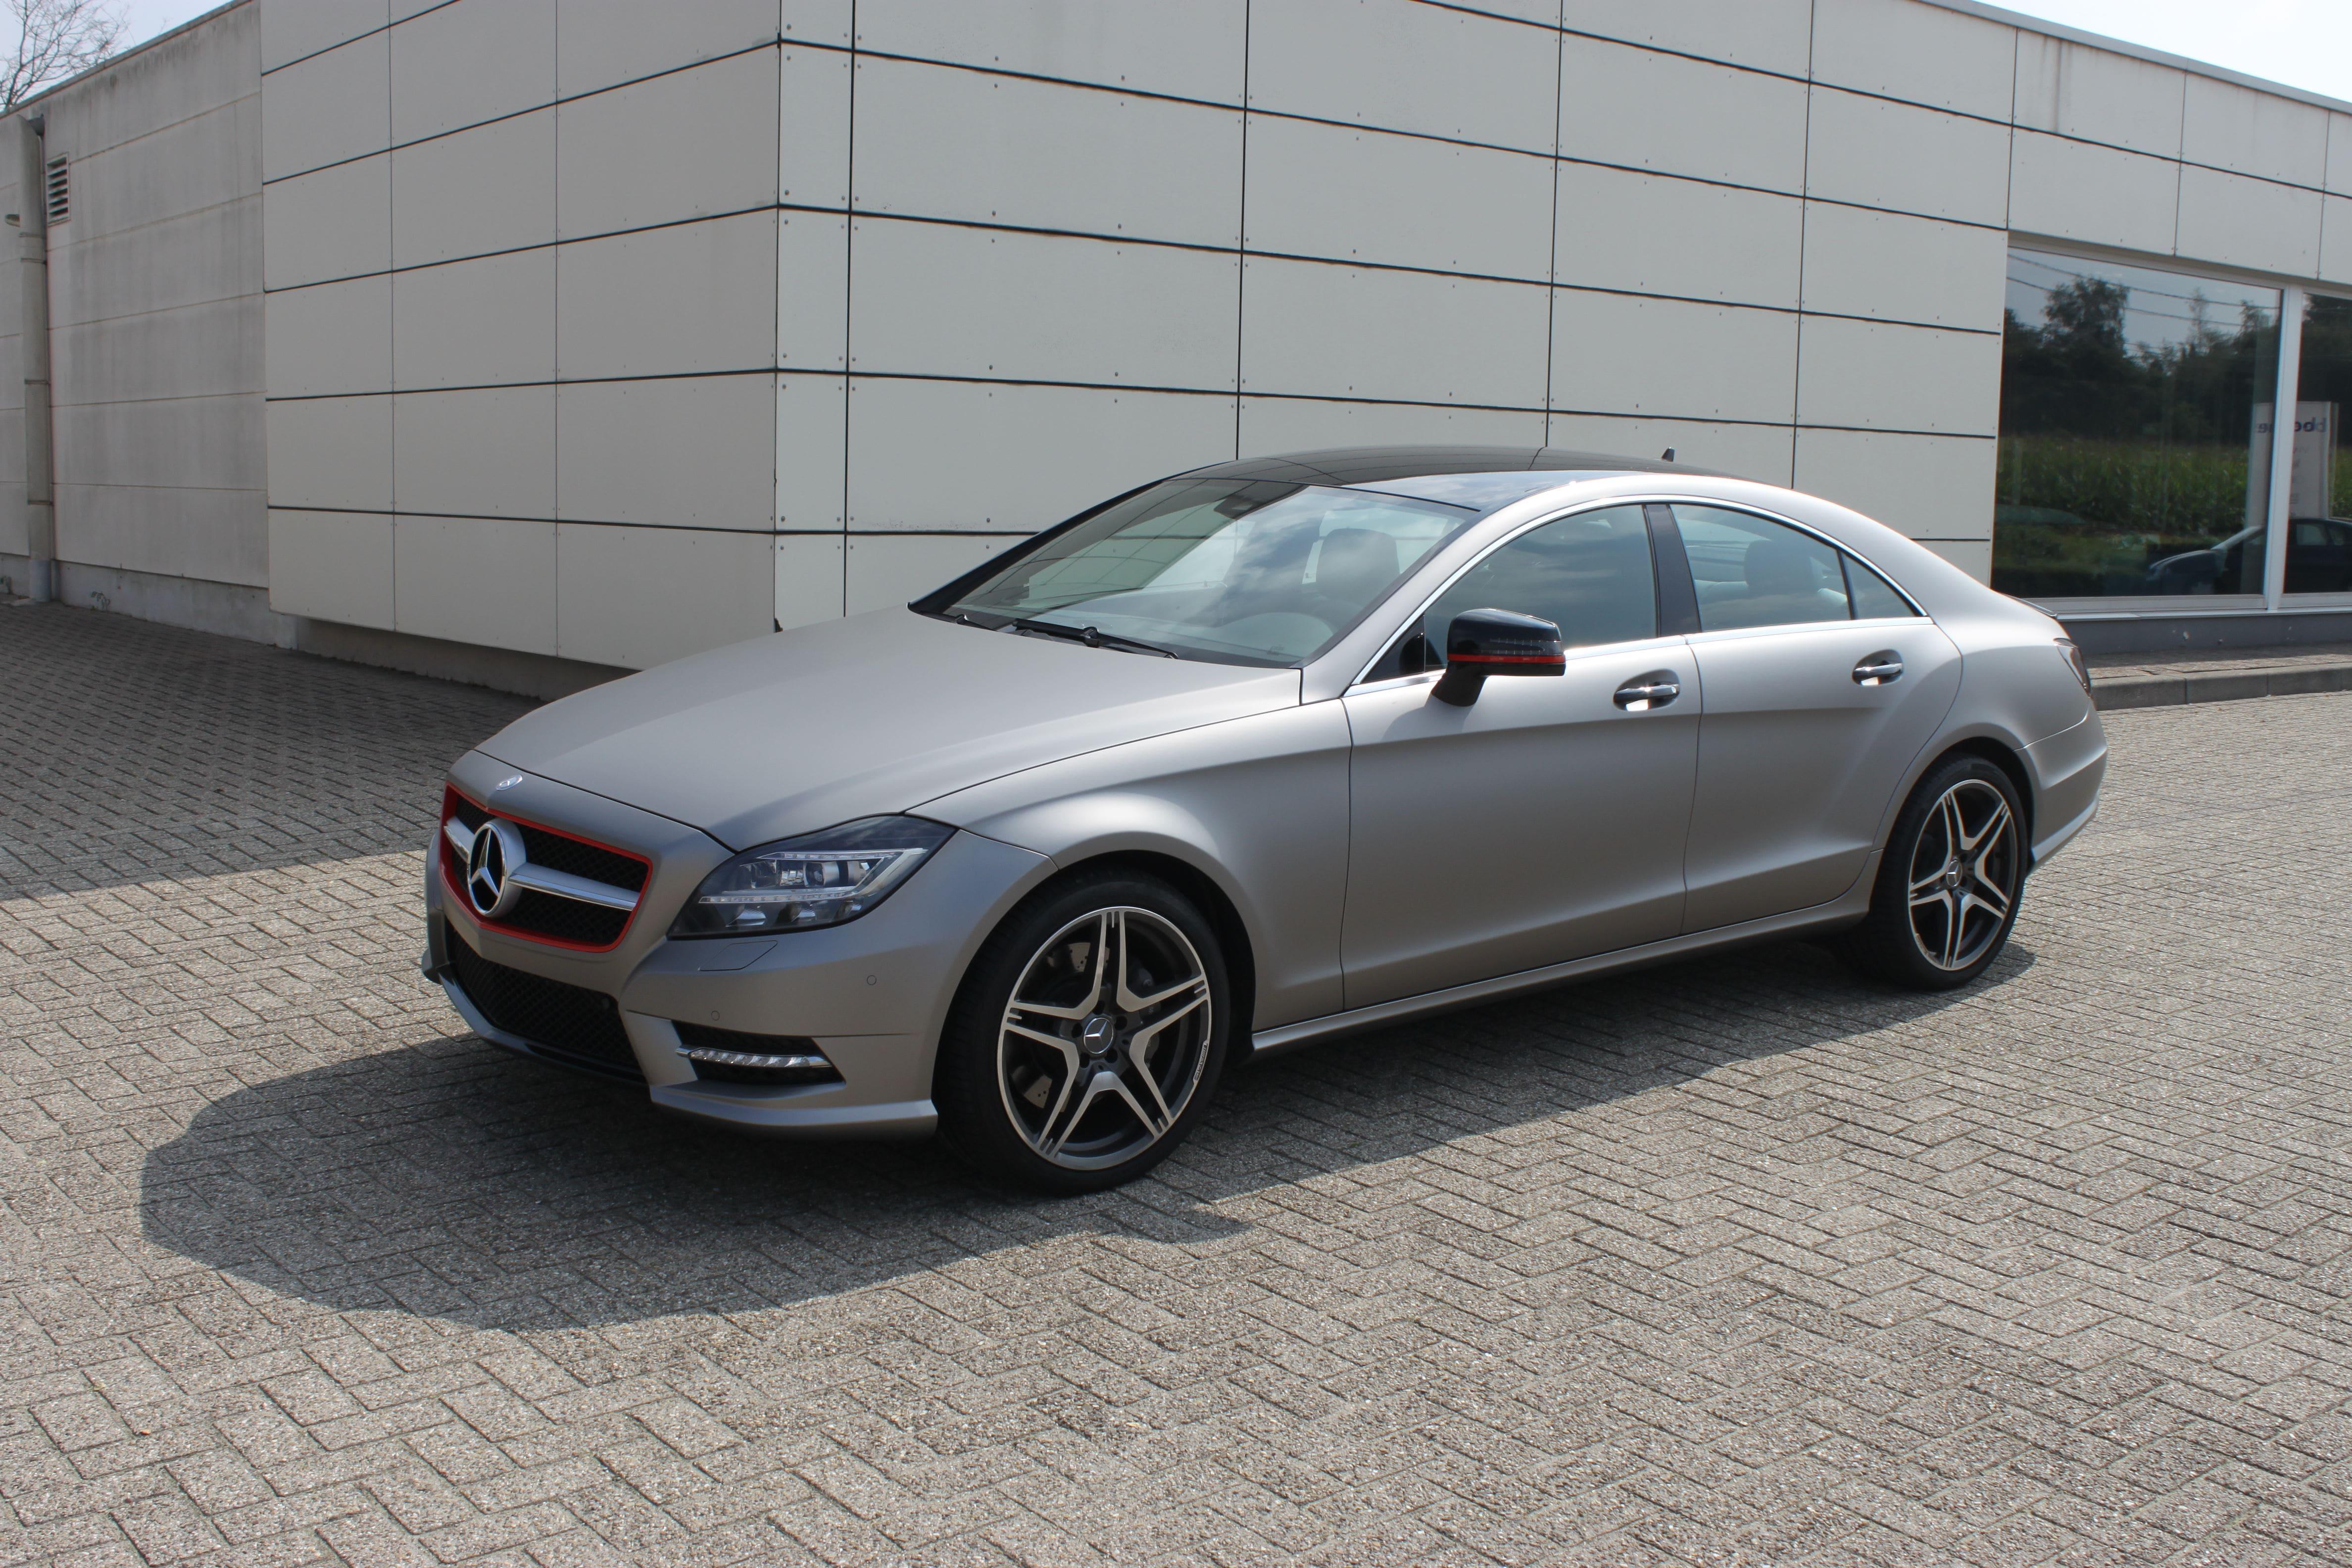 Mercedes CLS met Mat Grey Aluminium Wrap, Carwrapping door Wrapmyride.nu Foto-nr:6156, ©2020